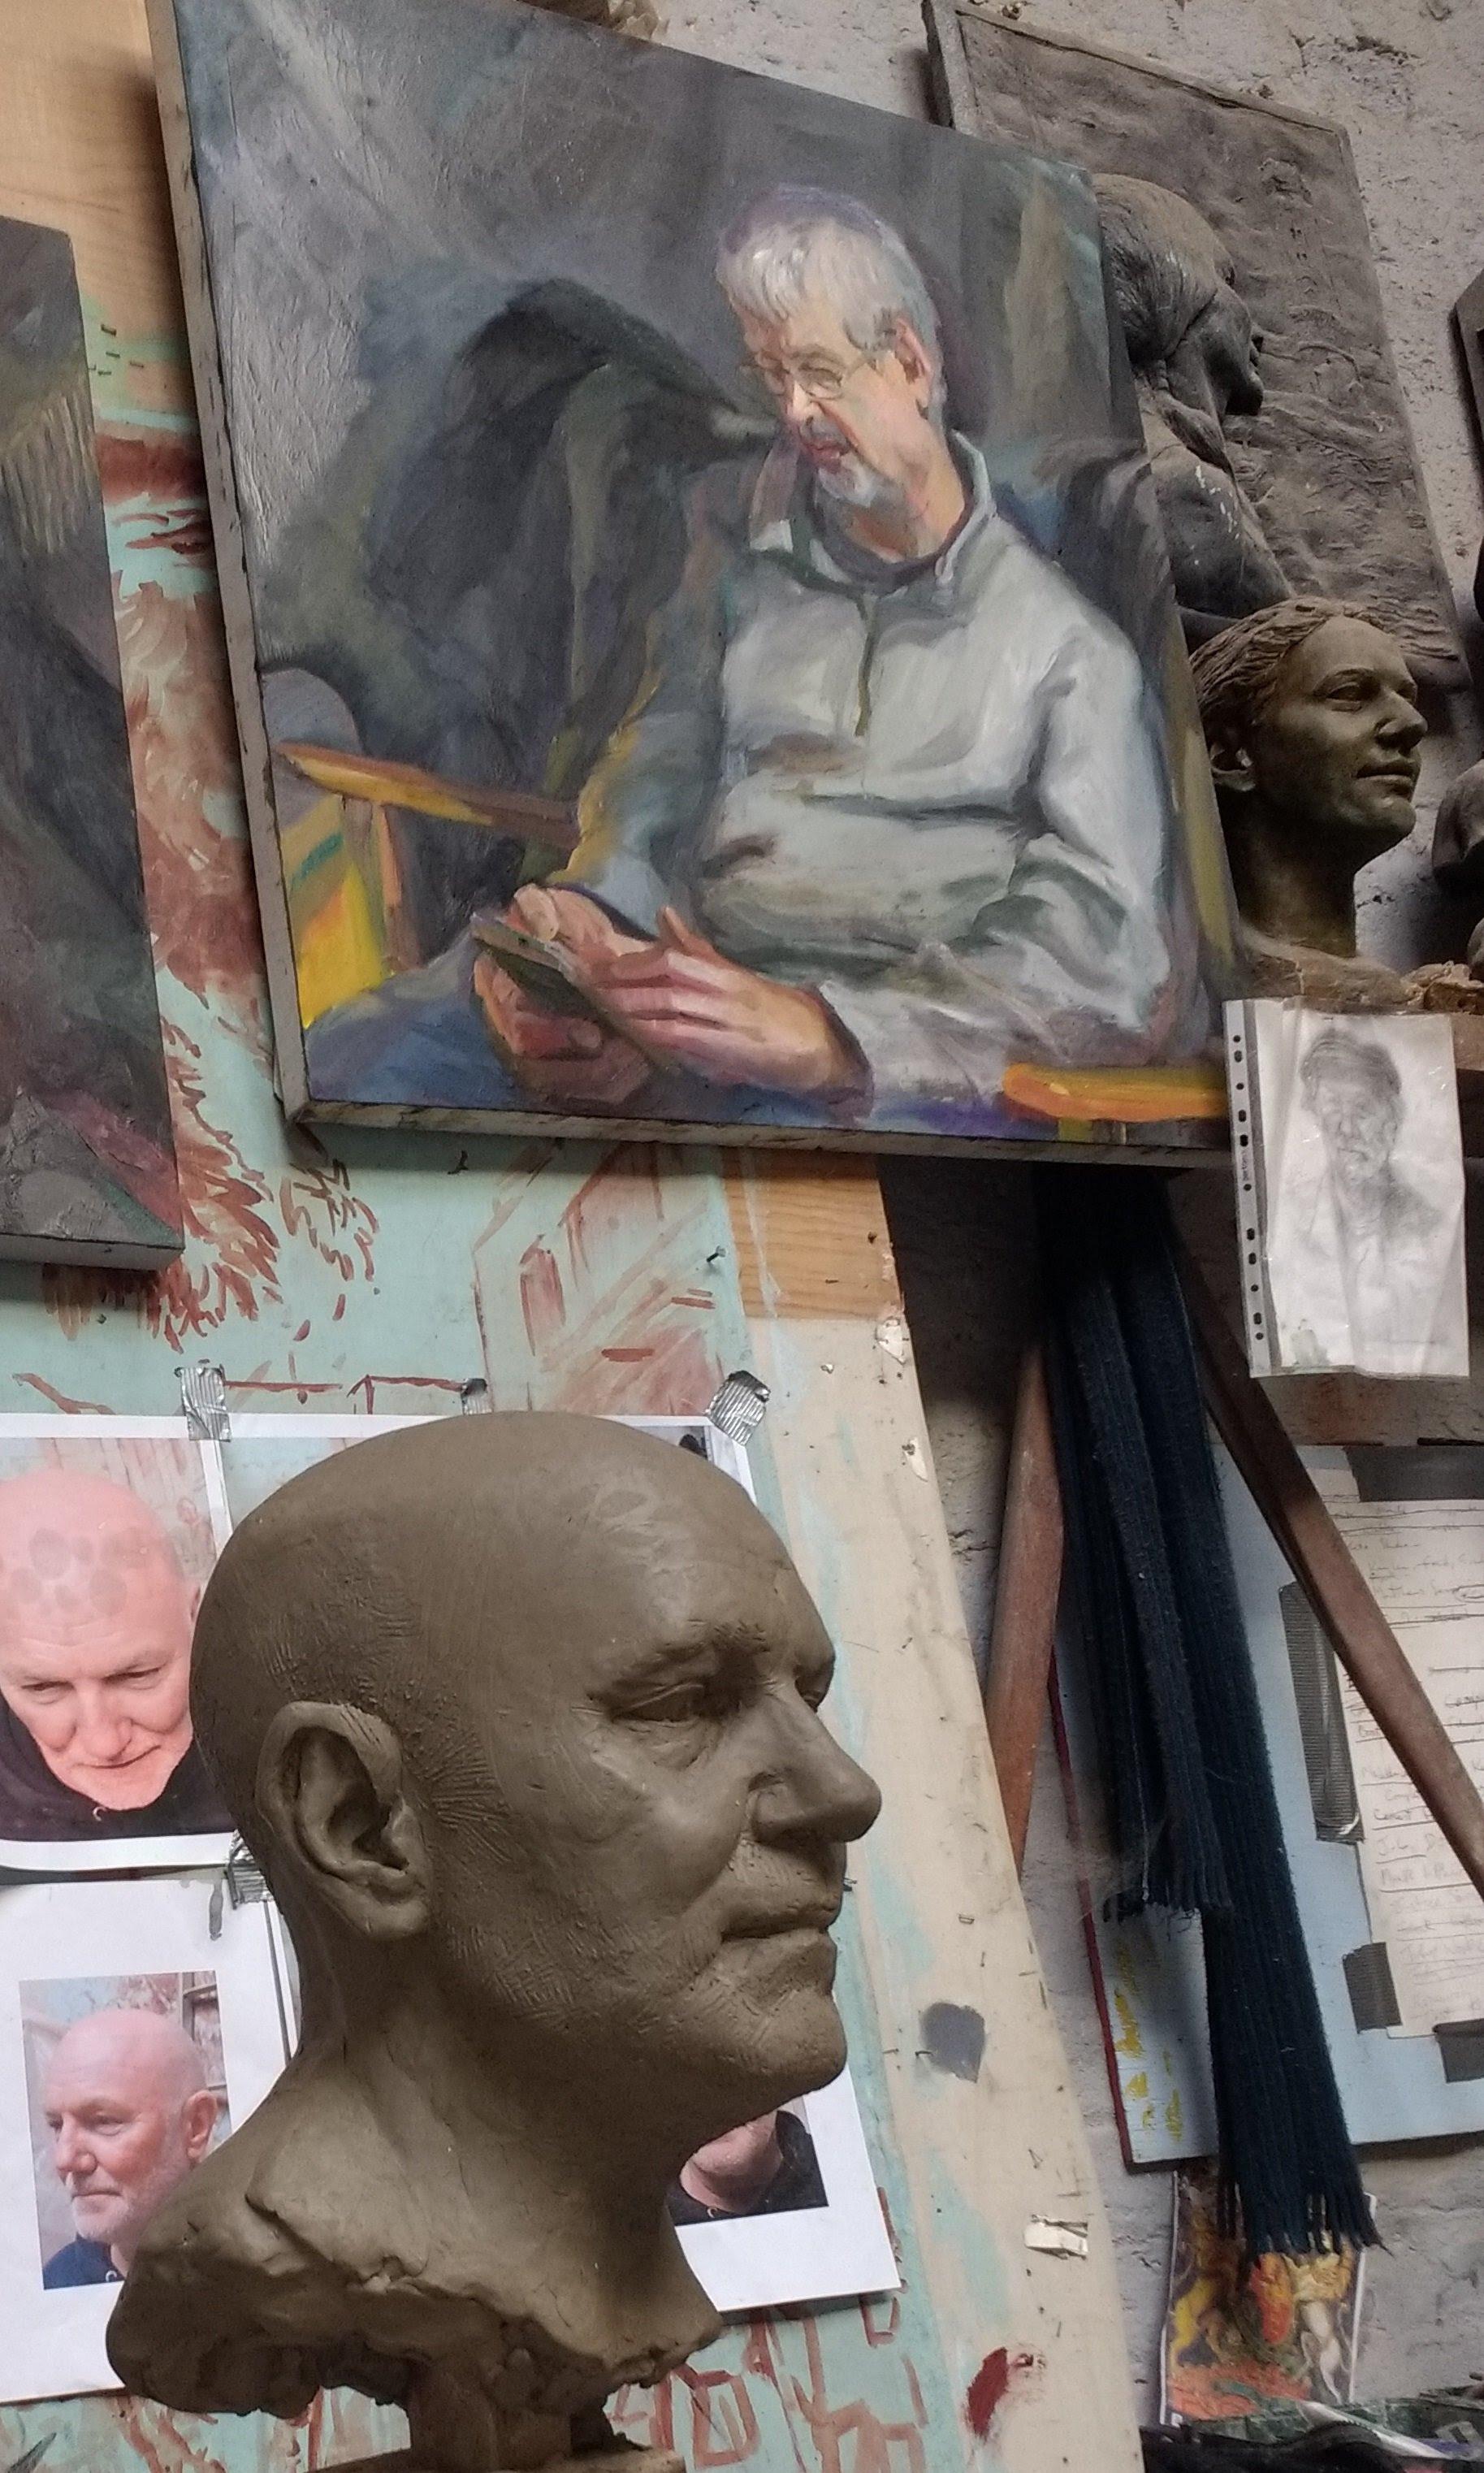 Kirkby Gallery: Portrait drawing demonstrations with Philip Garrett